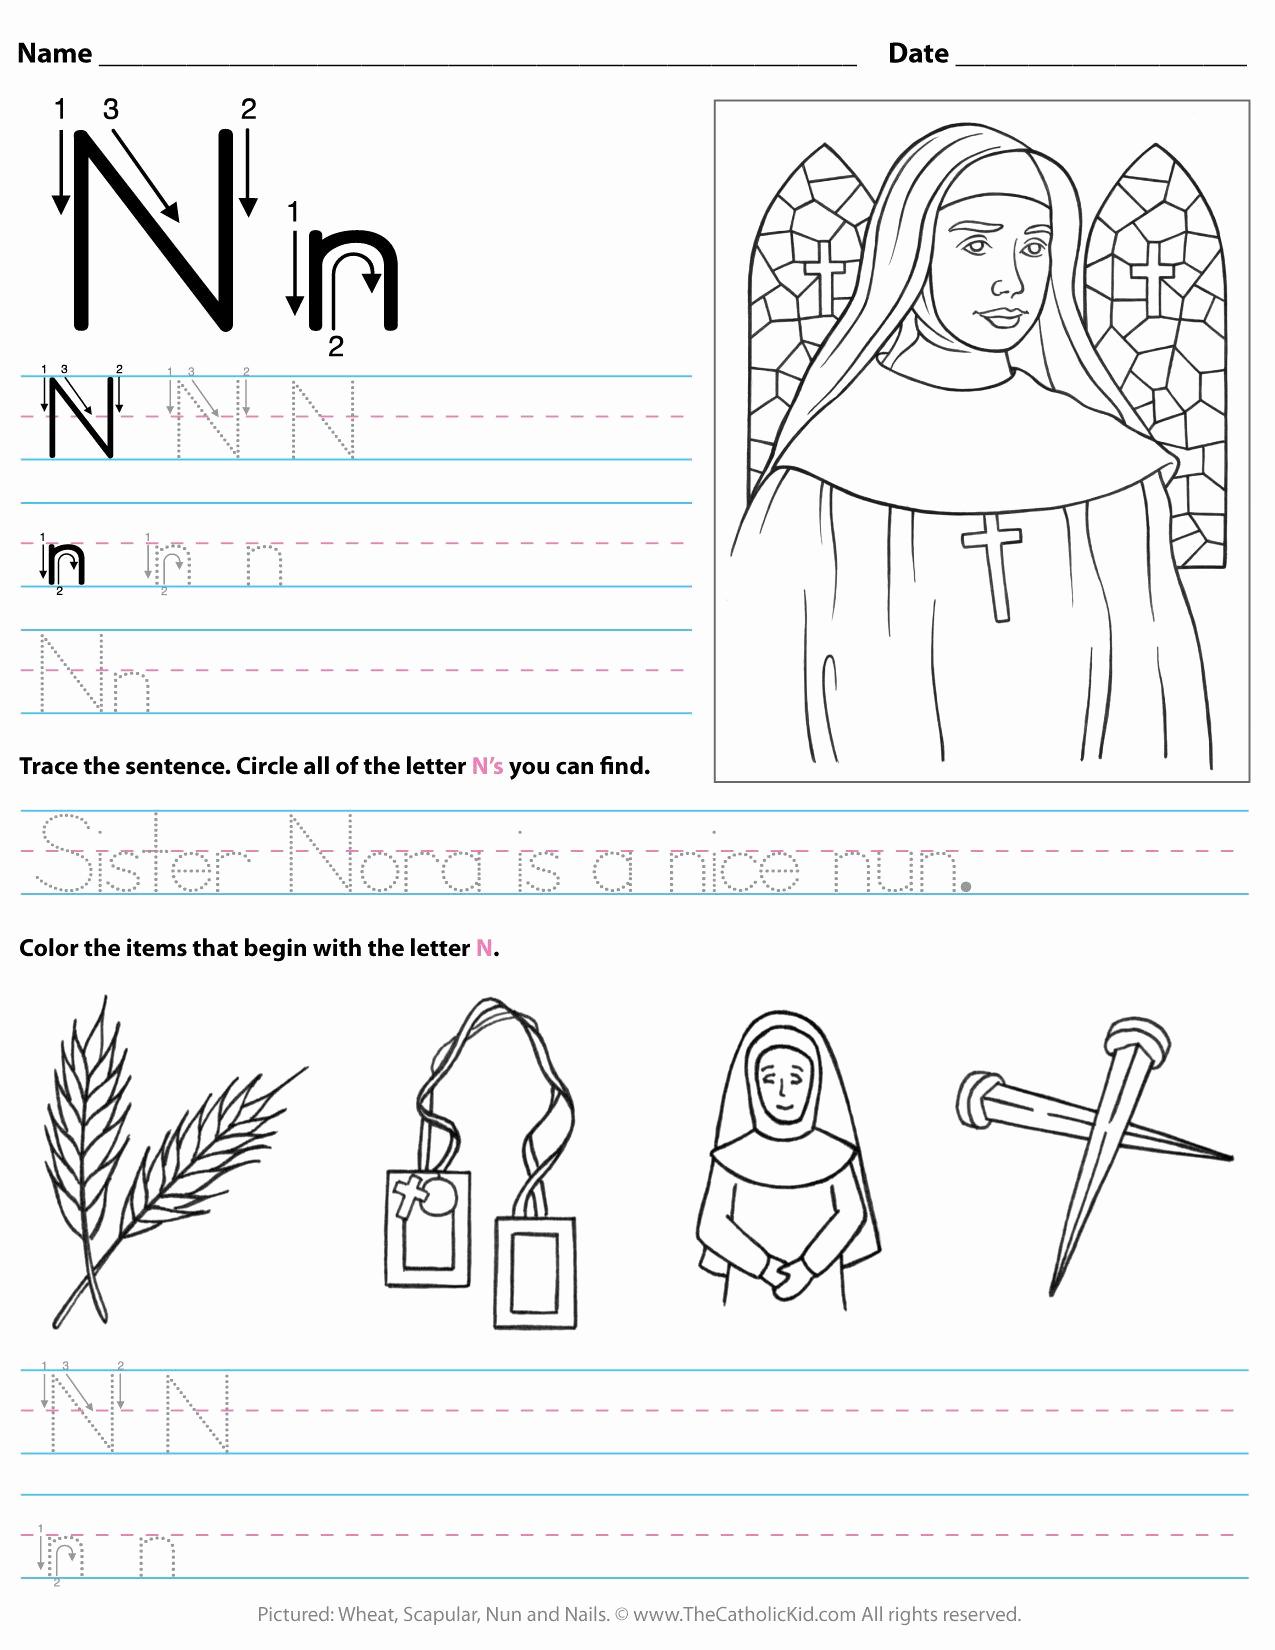 Letter N Worksheets for Kindergarten Beautiful Catholic Alphabet Letter N Worksheet Preschool